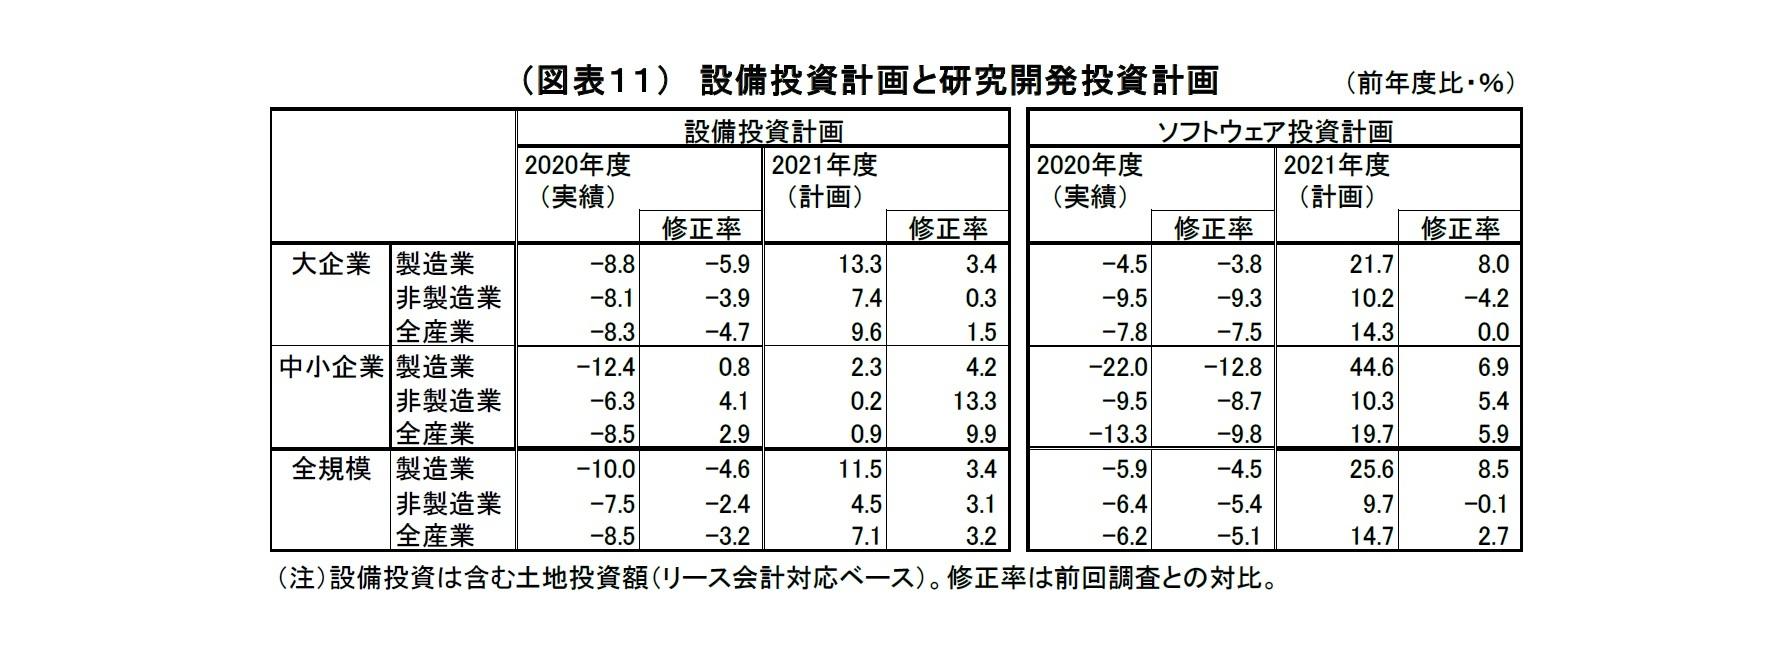 (図表11) 設備投資計画と研究開発投資計画